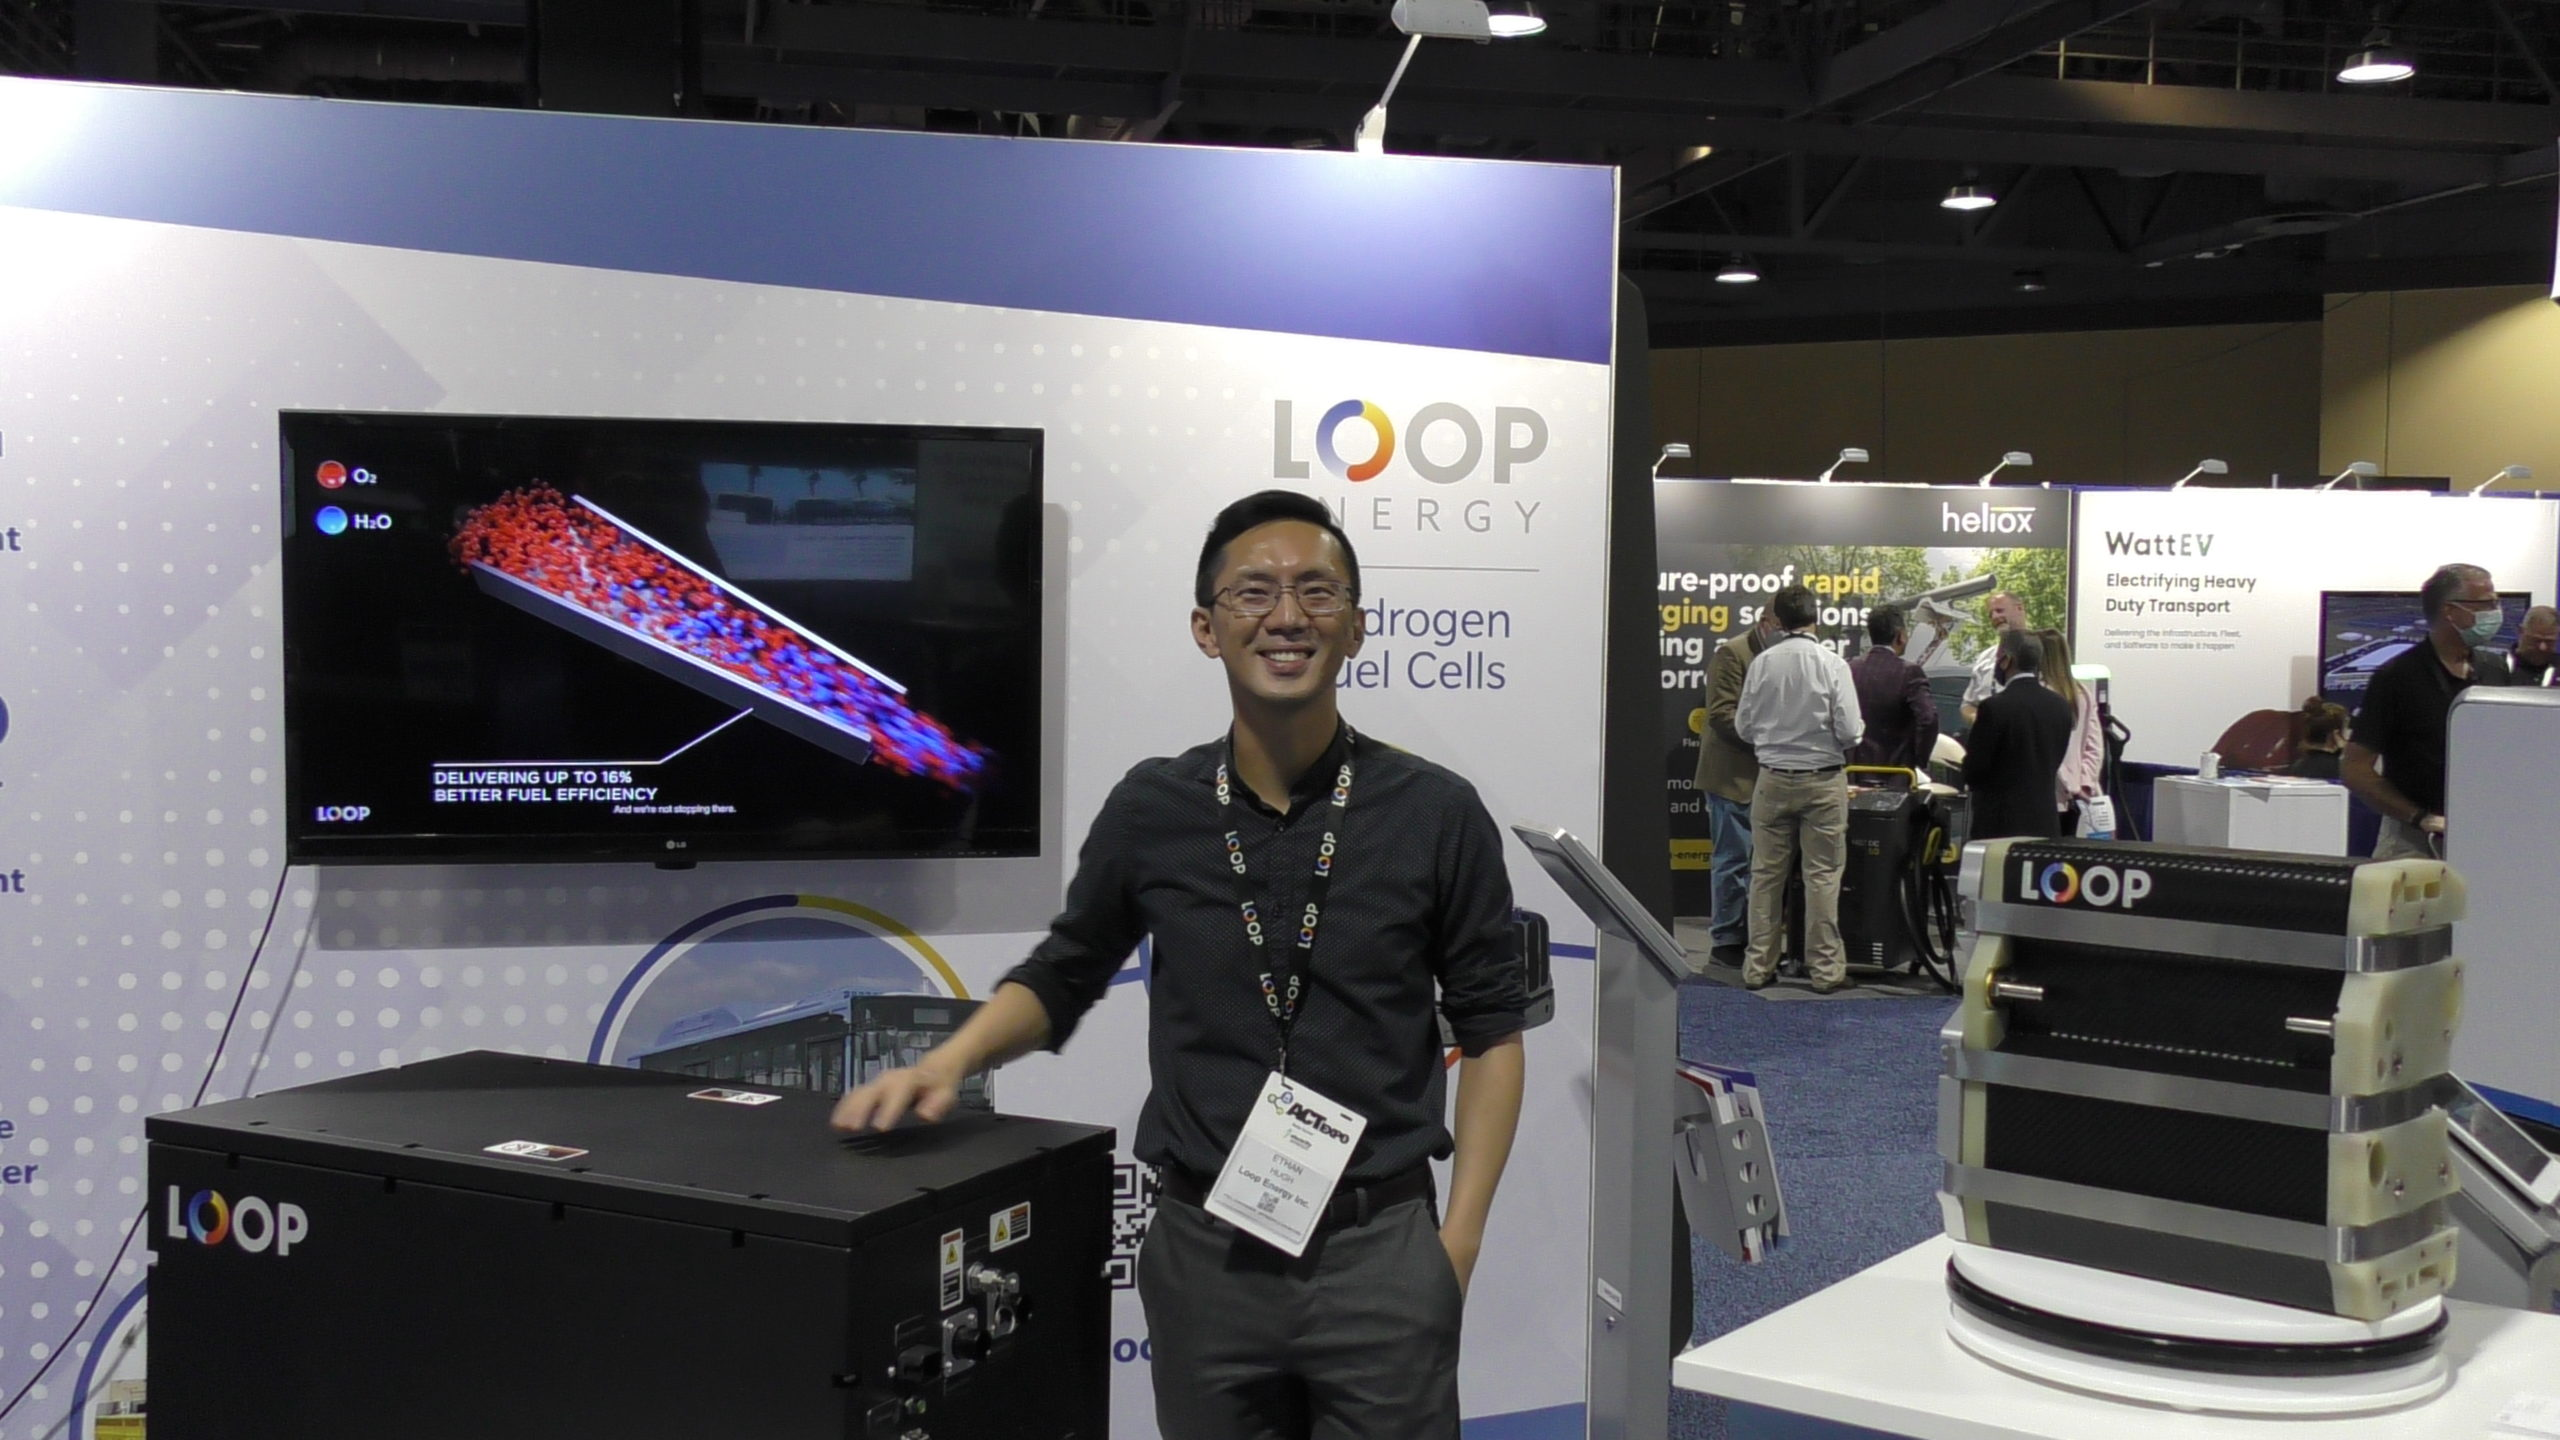 fuelcellsworks, loop energy, marketing director, ethan hugh